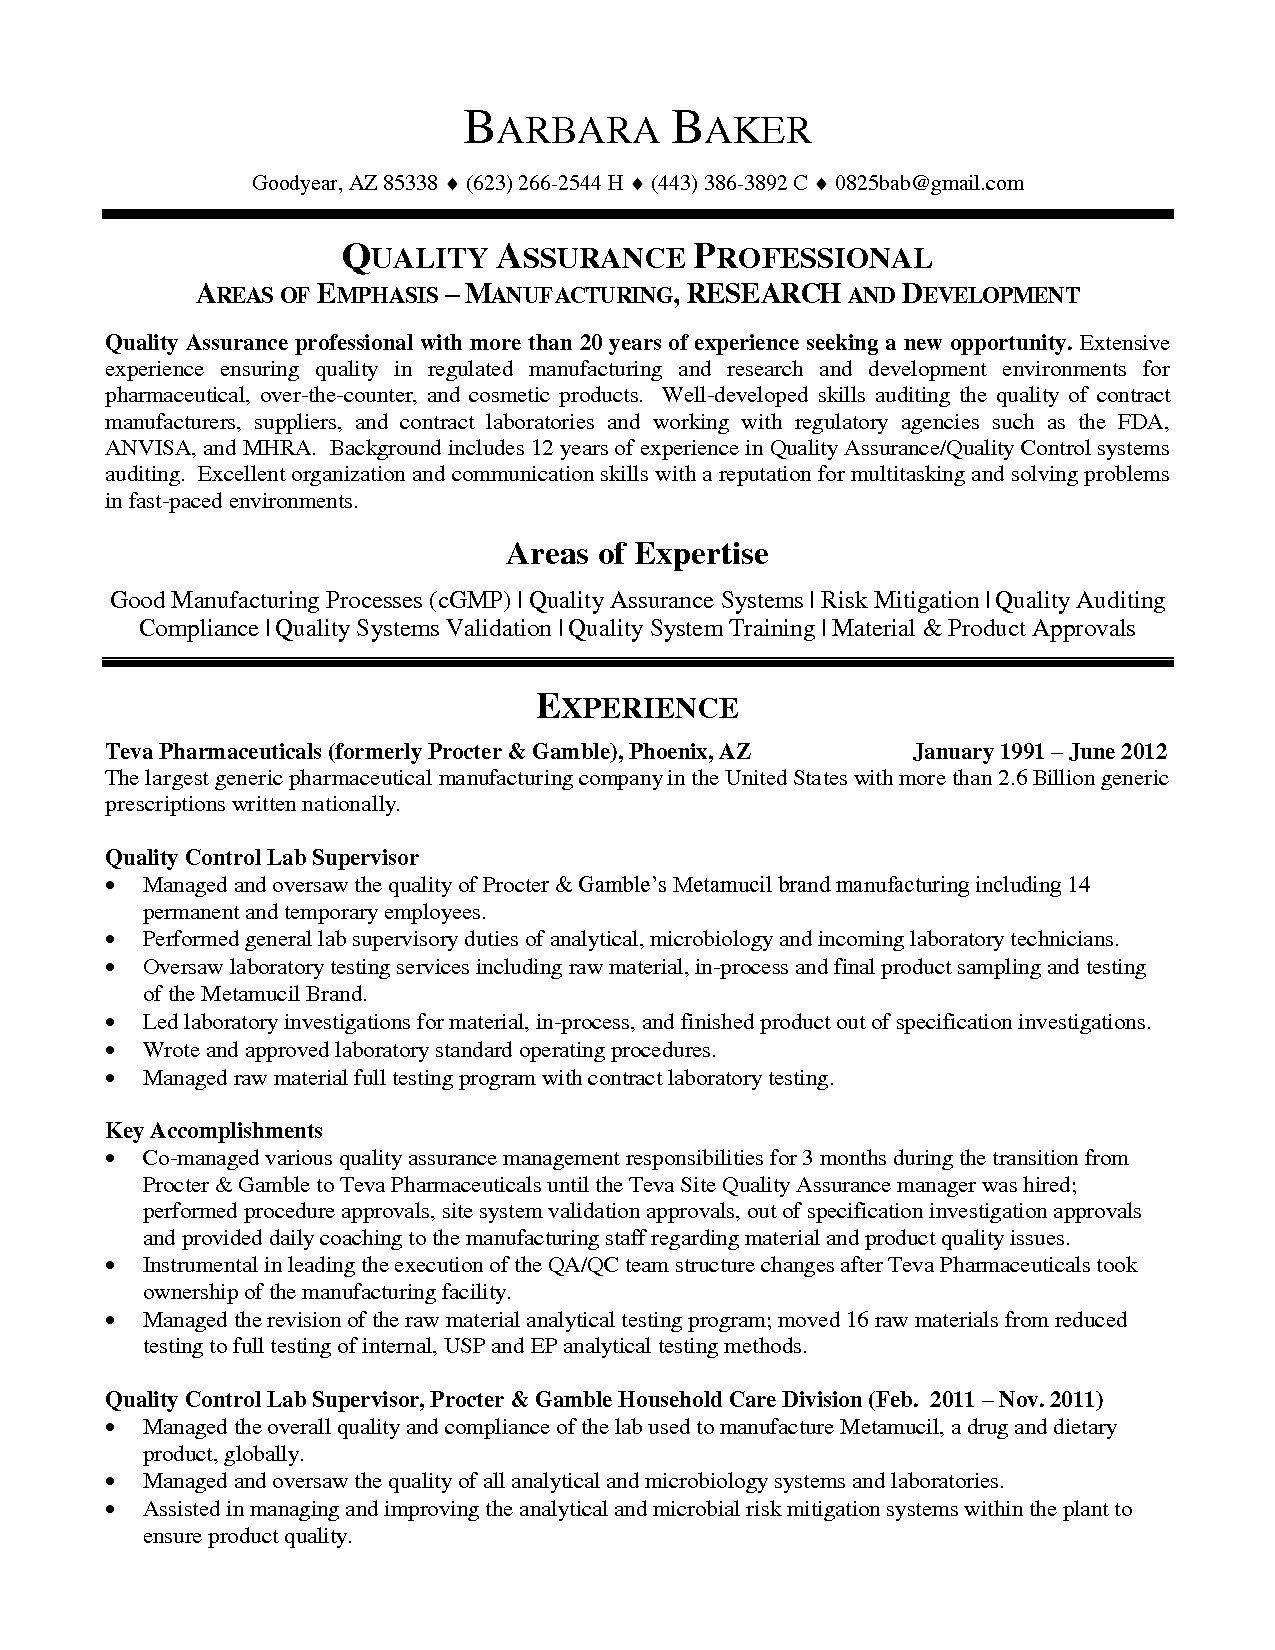 Quality Assurance Manager Resume Templates Pinterest Sample